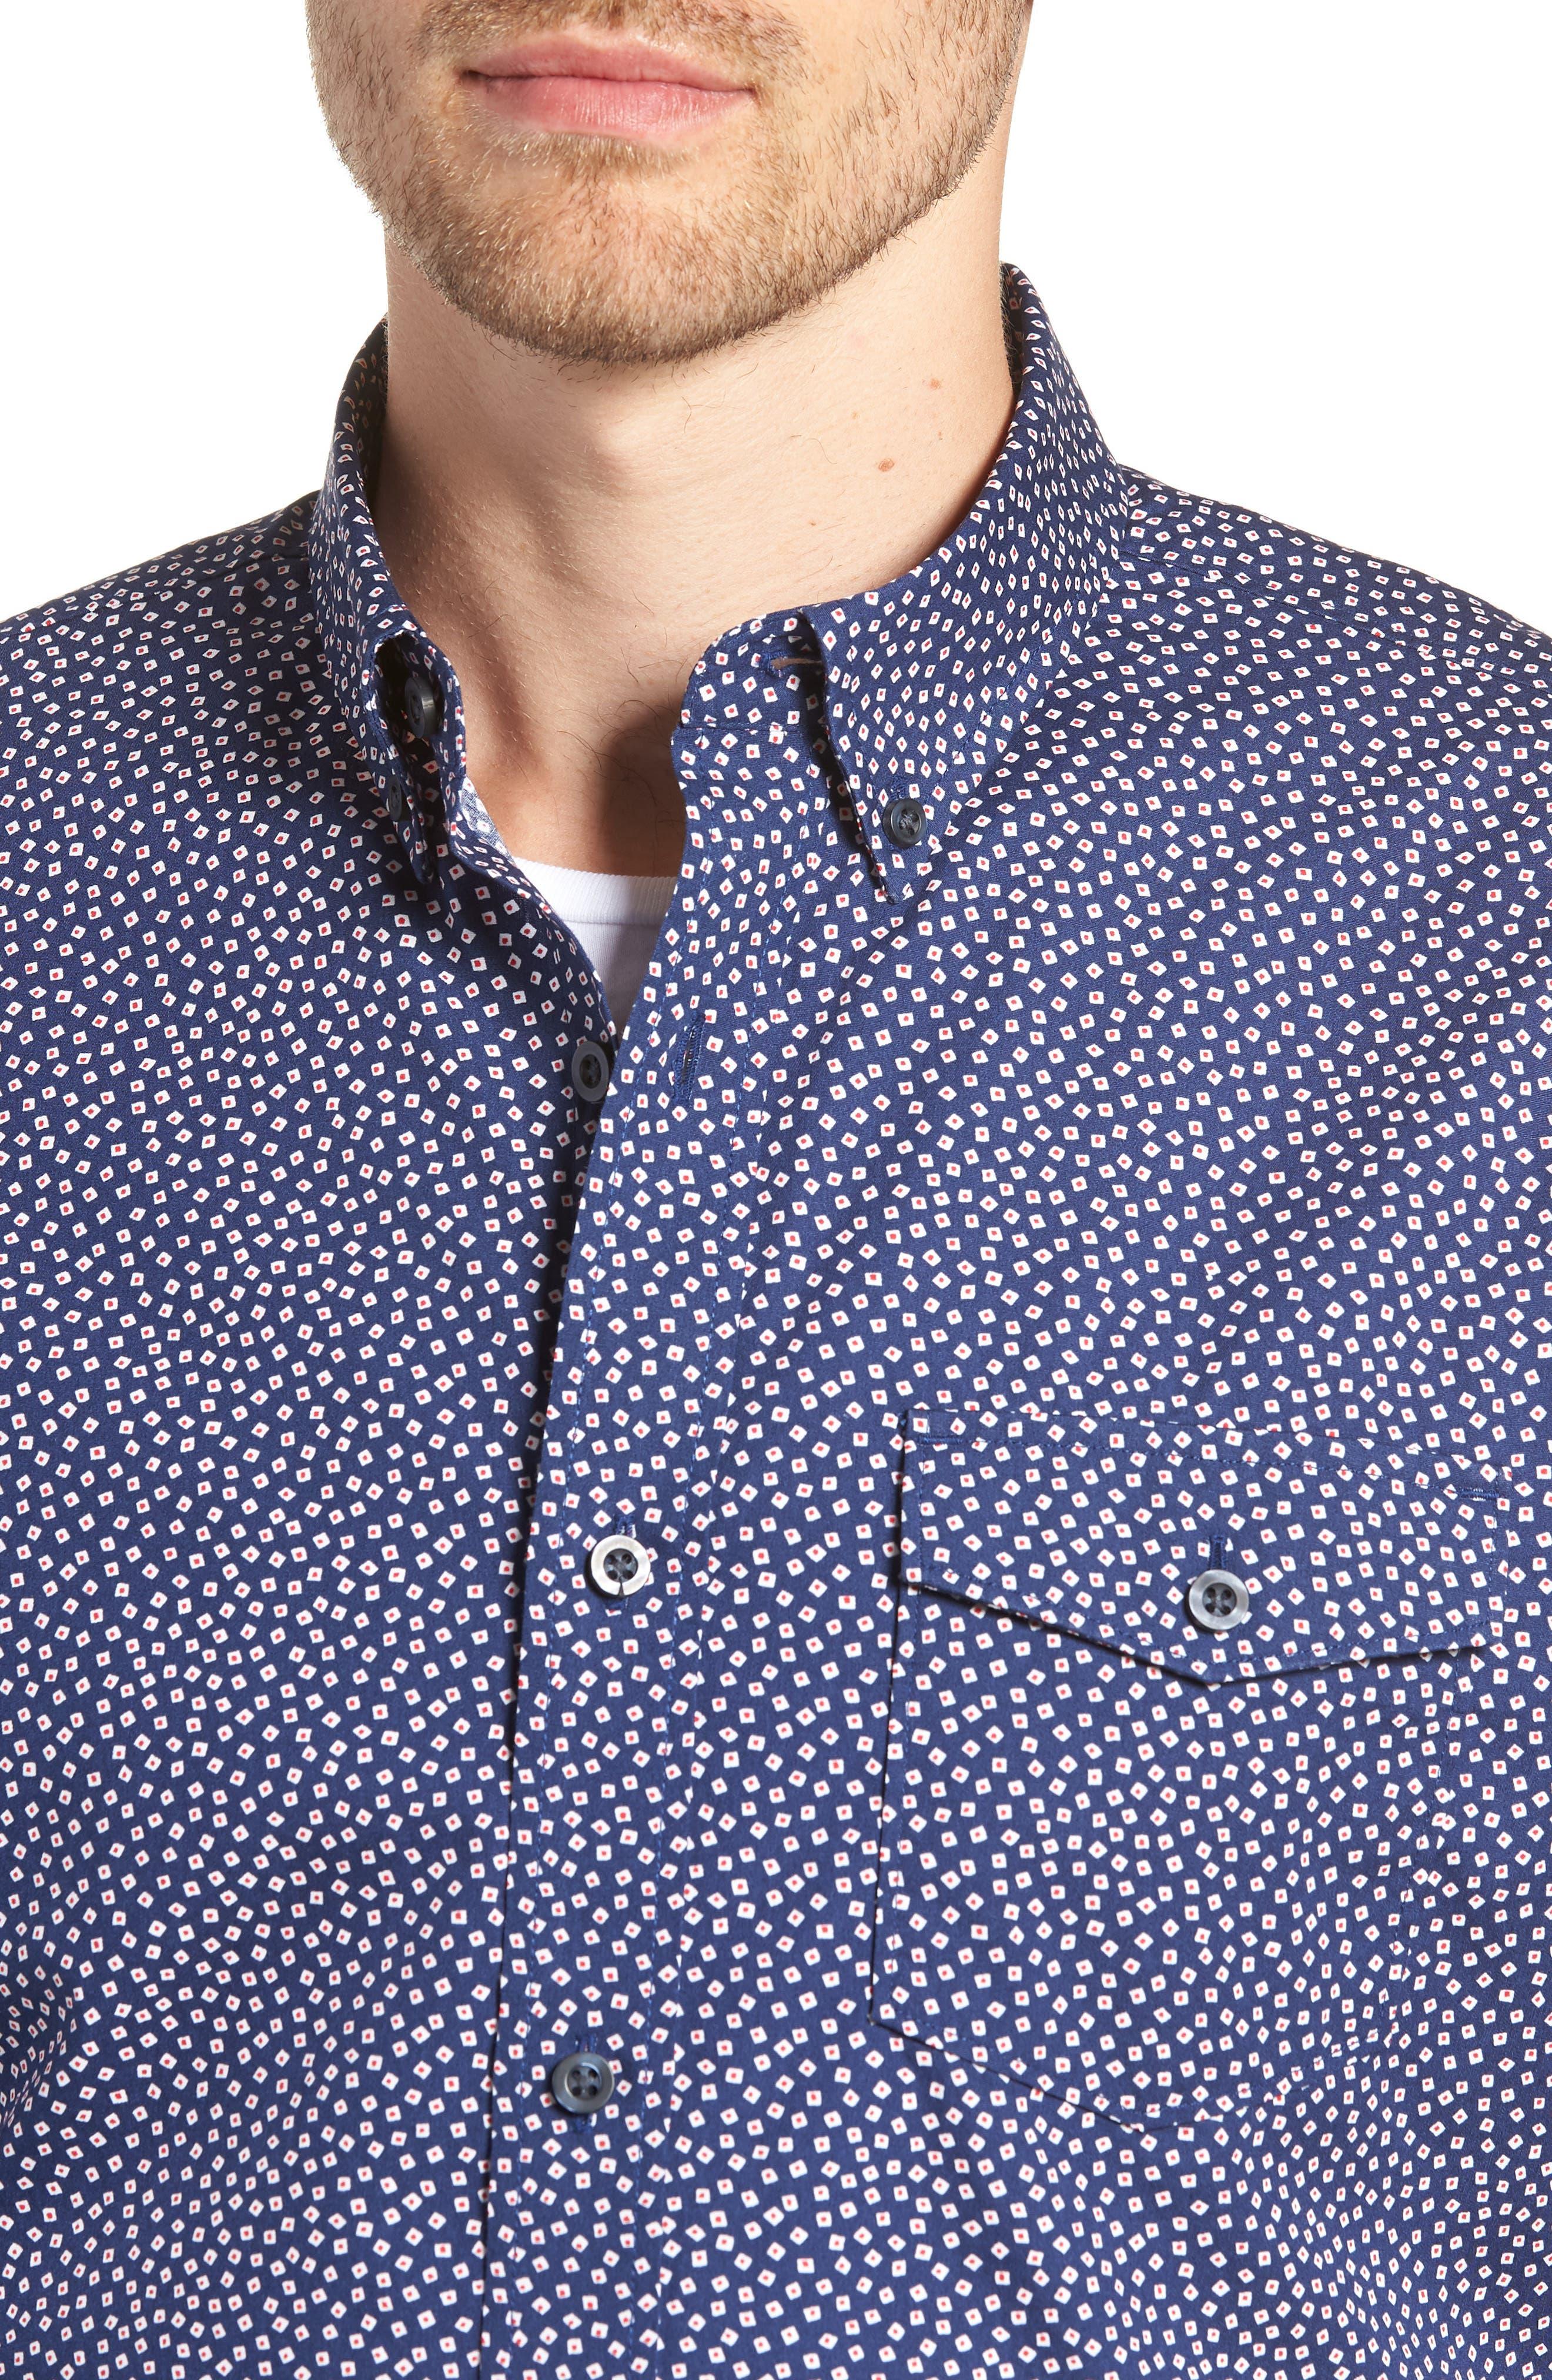 Ivy Trim Fit Print Sport Shirt,                             Alternate thumbnail 2, color,                             Navy Iris Tossed Squares